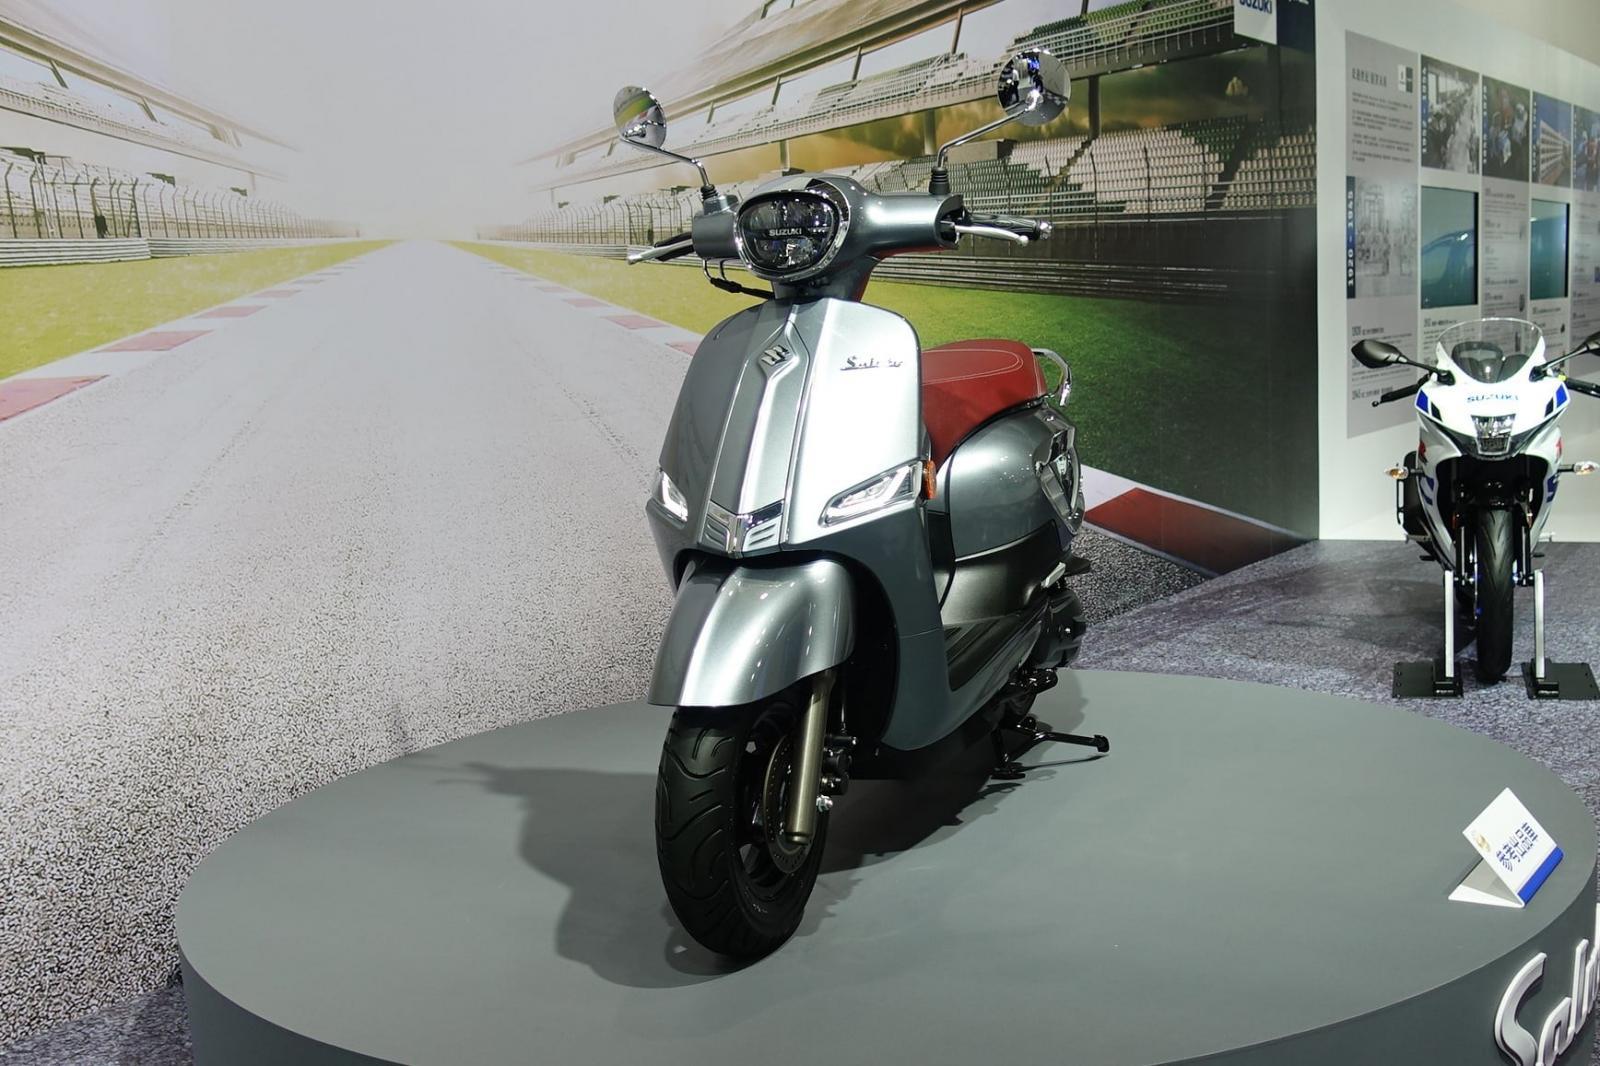 Suzuki Saluto 125